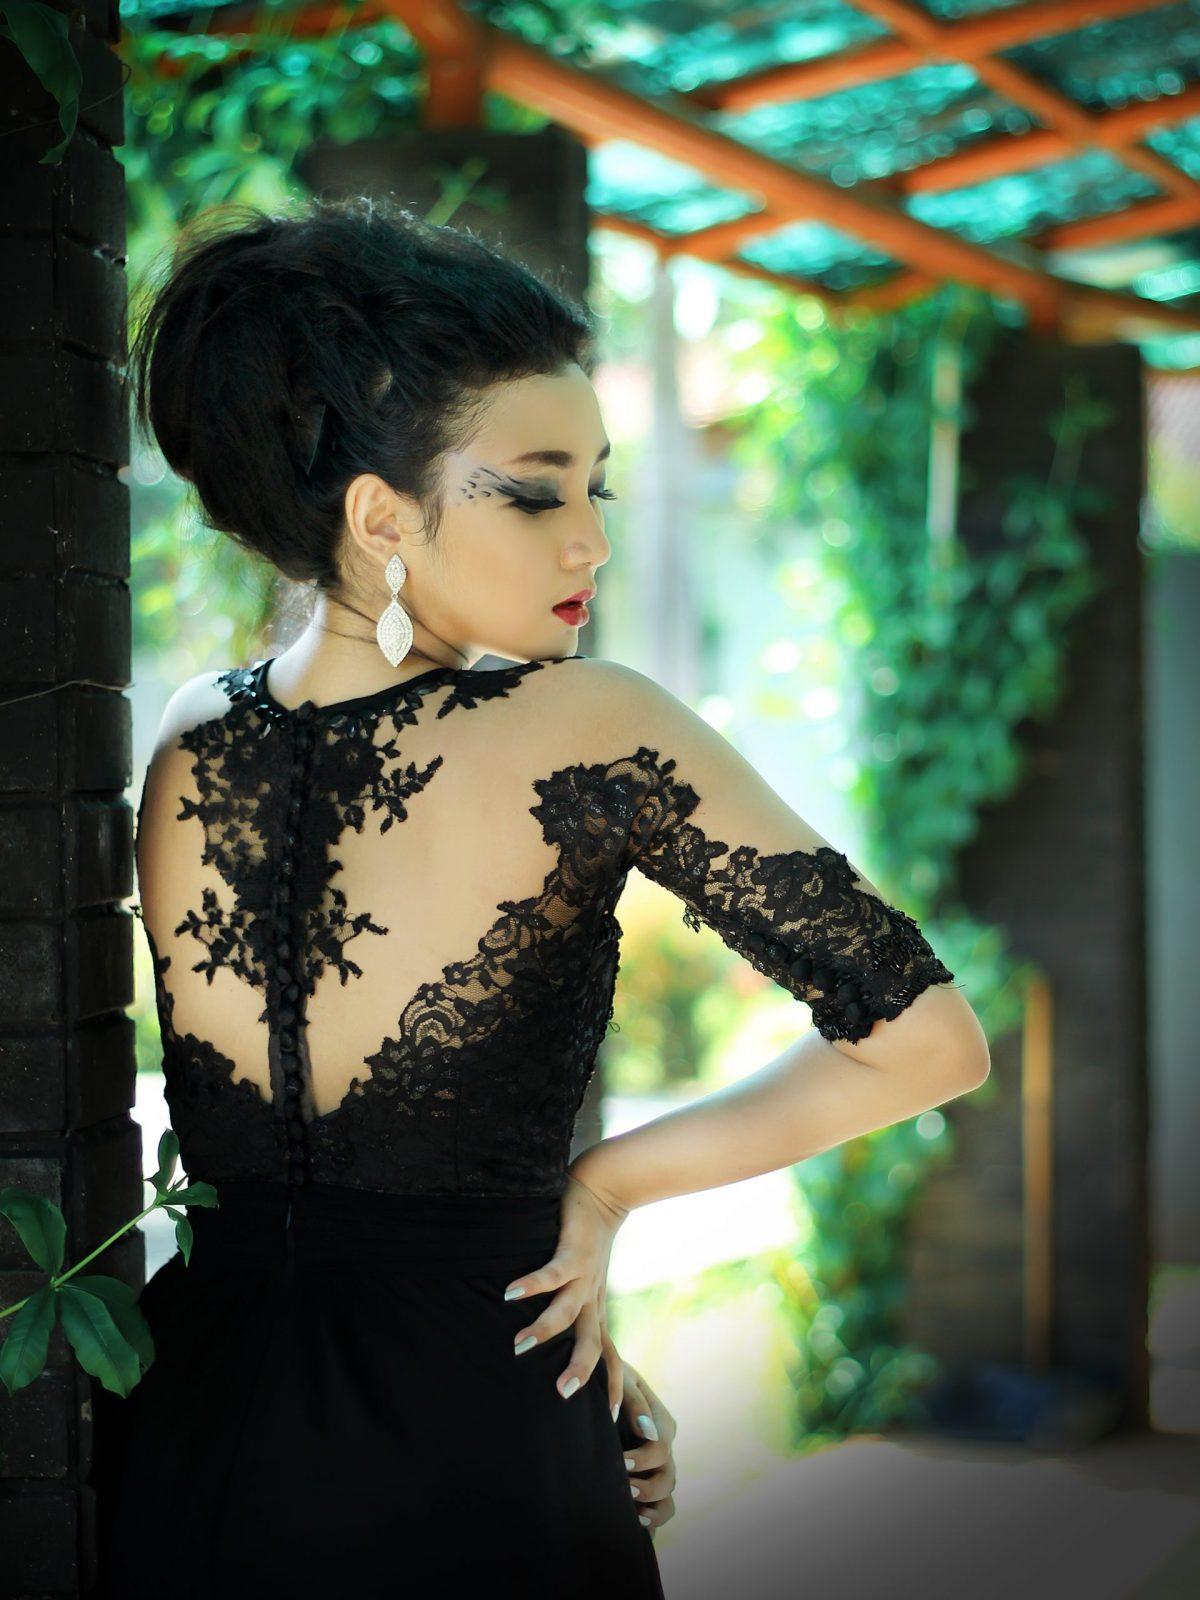 woman-photography-female-pattern-model-green-893110-pxhere.com_